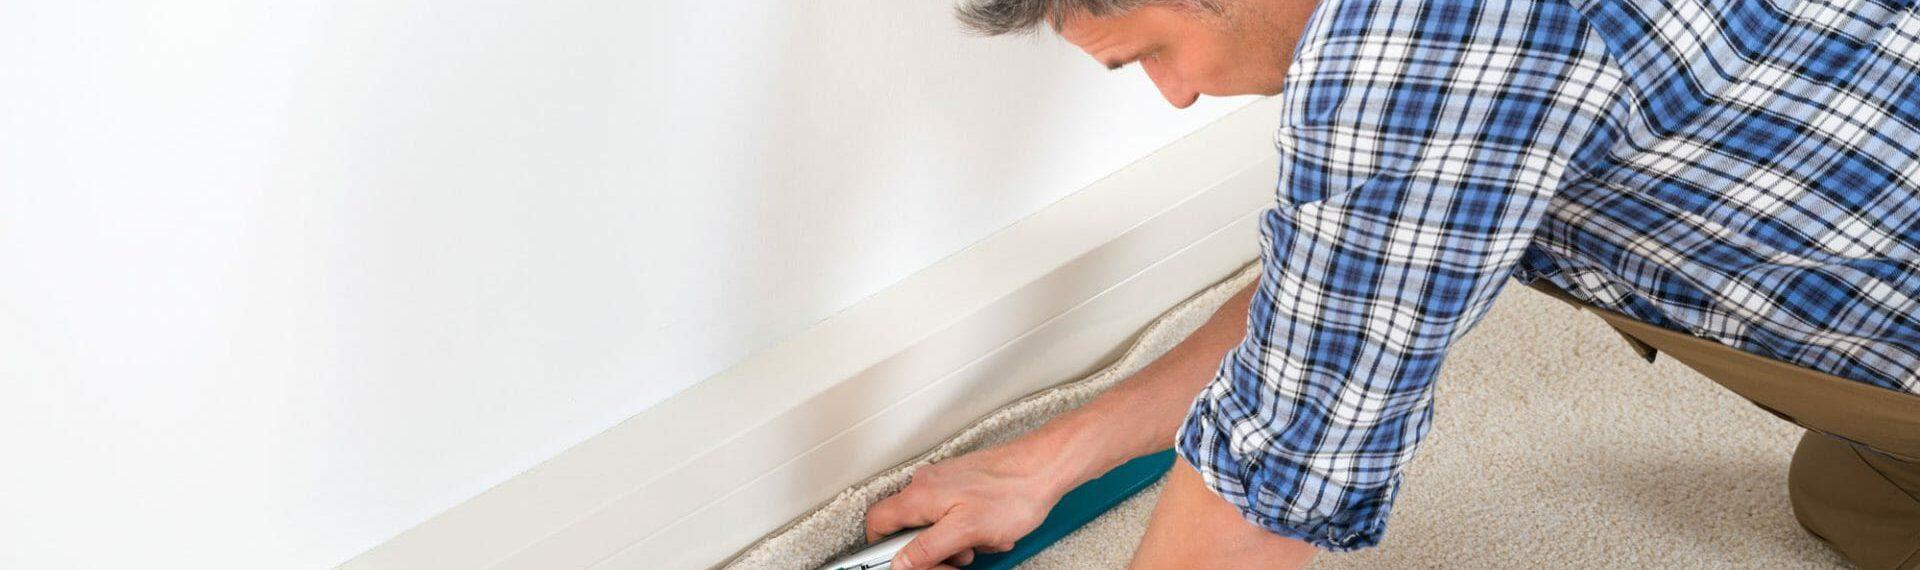 carpet fitter cutting the edge of a cream carpet